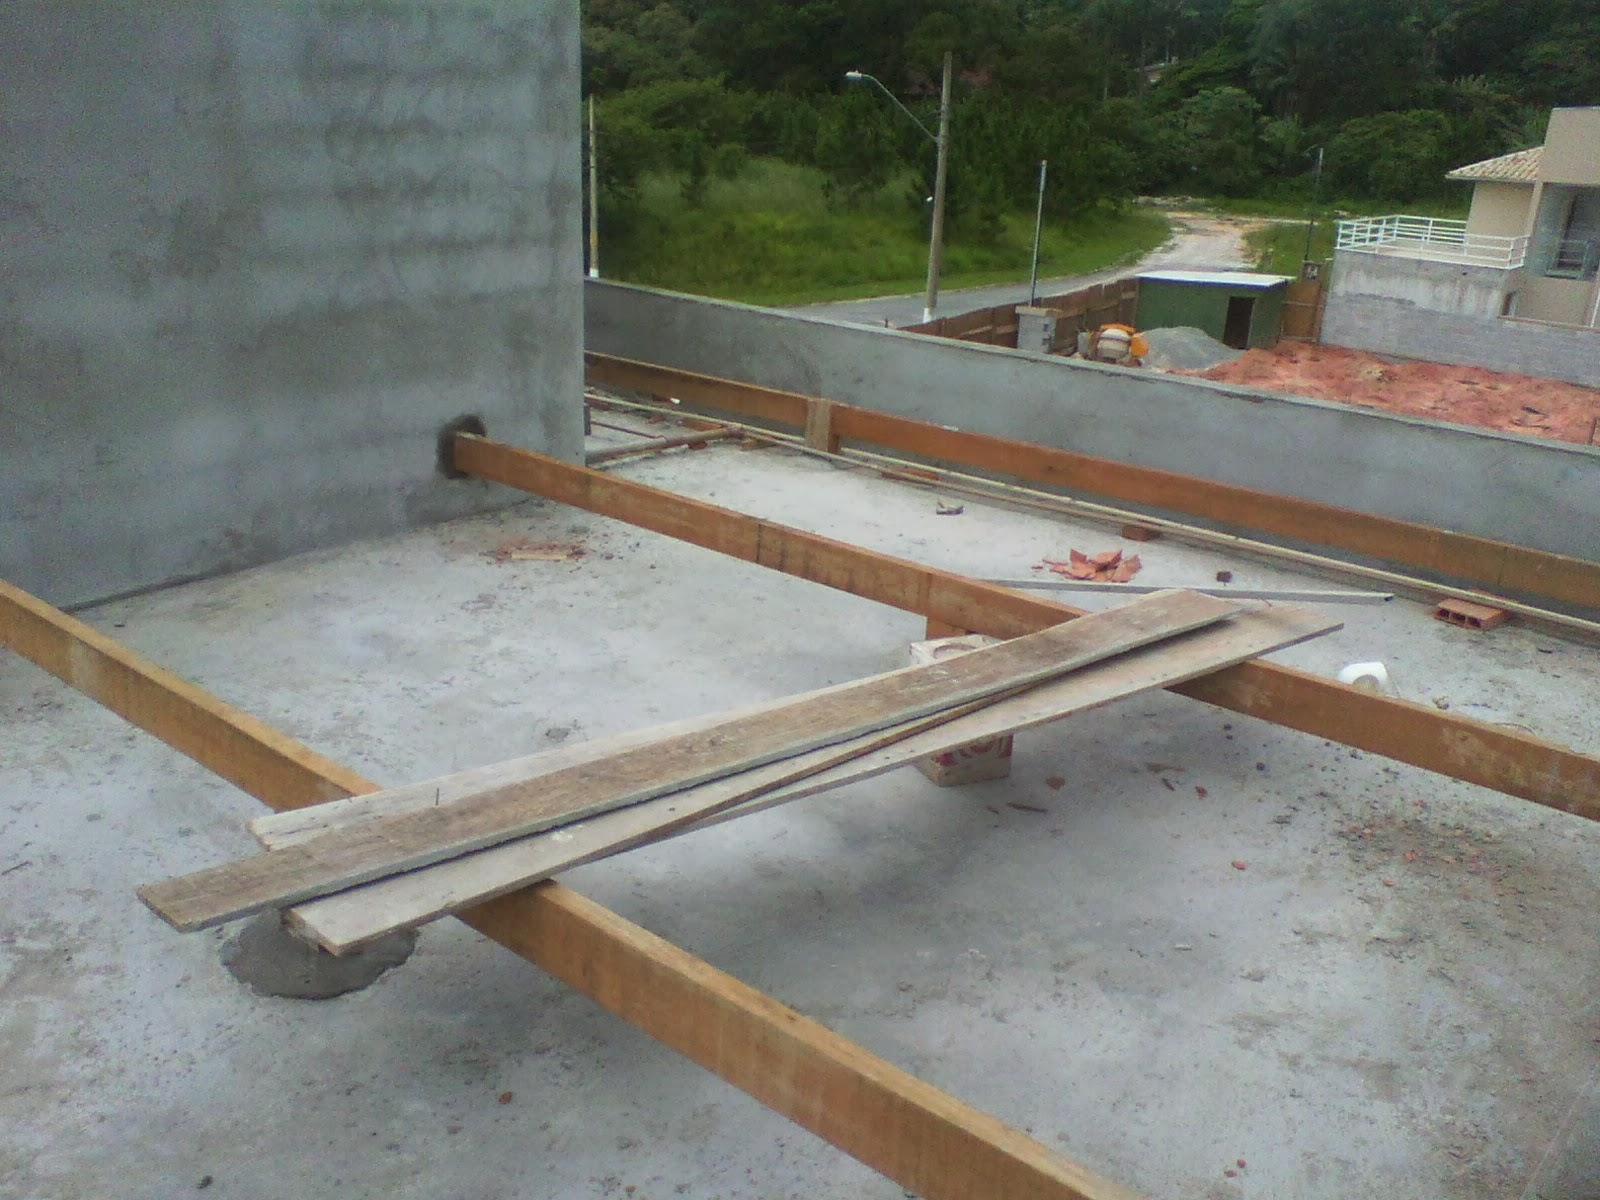 Casa Tony & Ta: Caixa d'agua Instalada e Madeiramento Telhado #4B5B2F 1600x1200